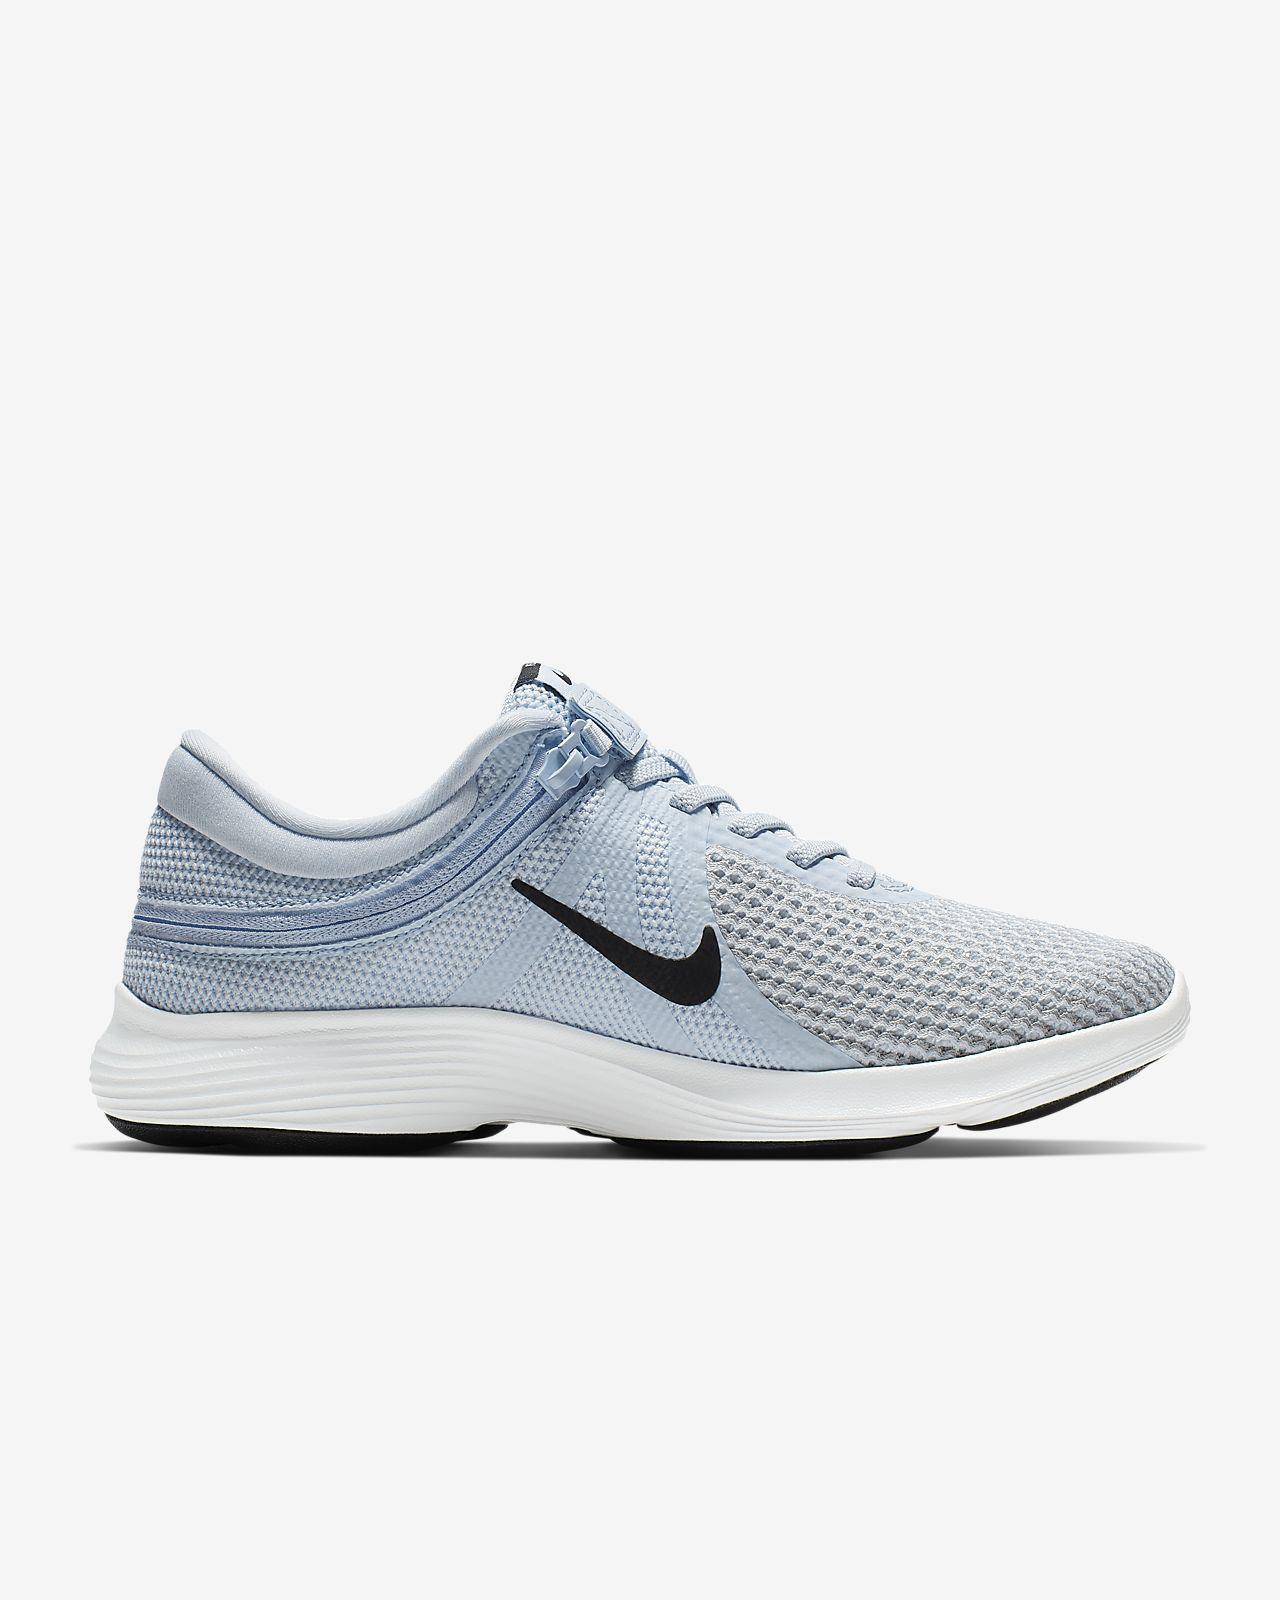 Chaussure Revolution Femme Pour De Running Flyease 4 Nike R54AqL3j